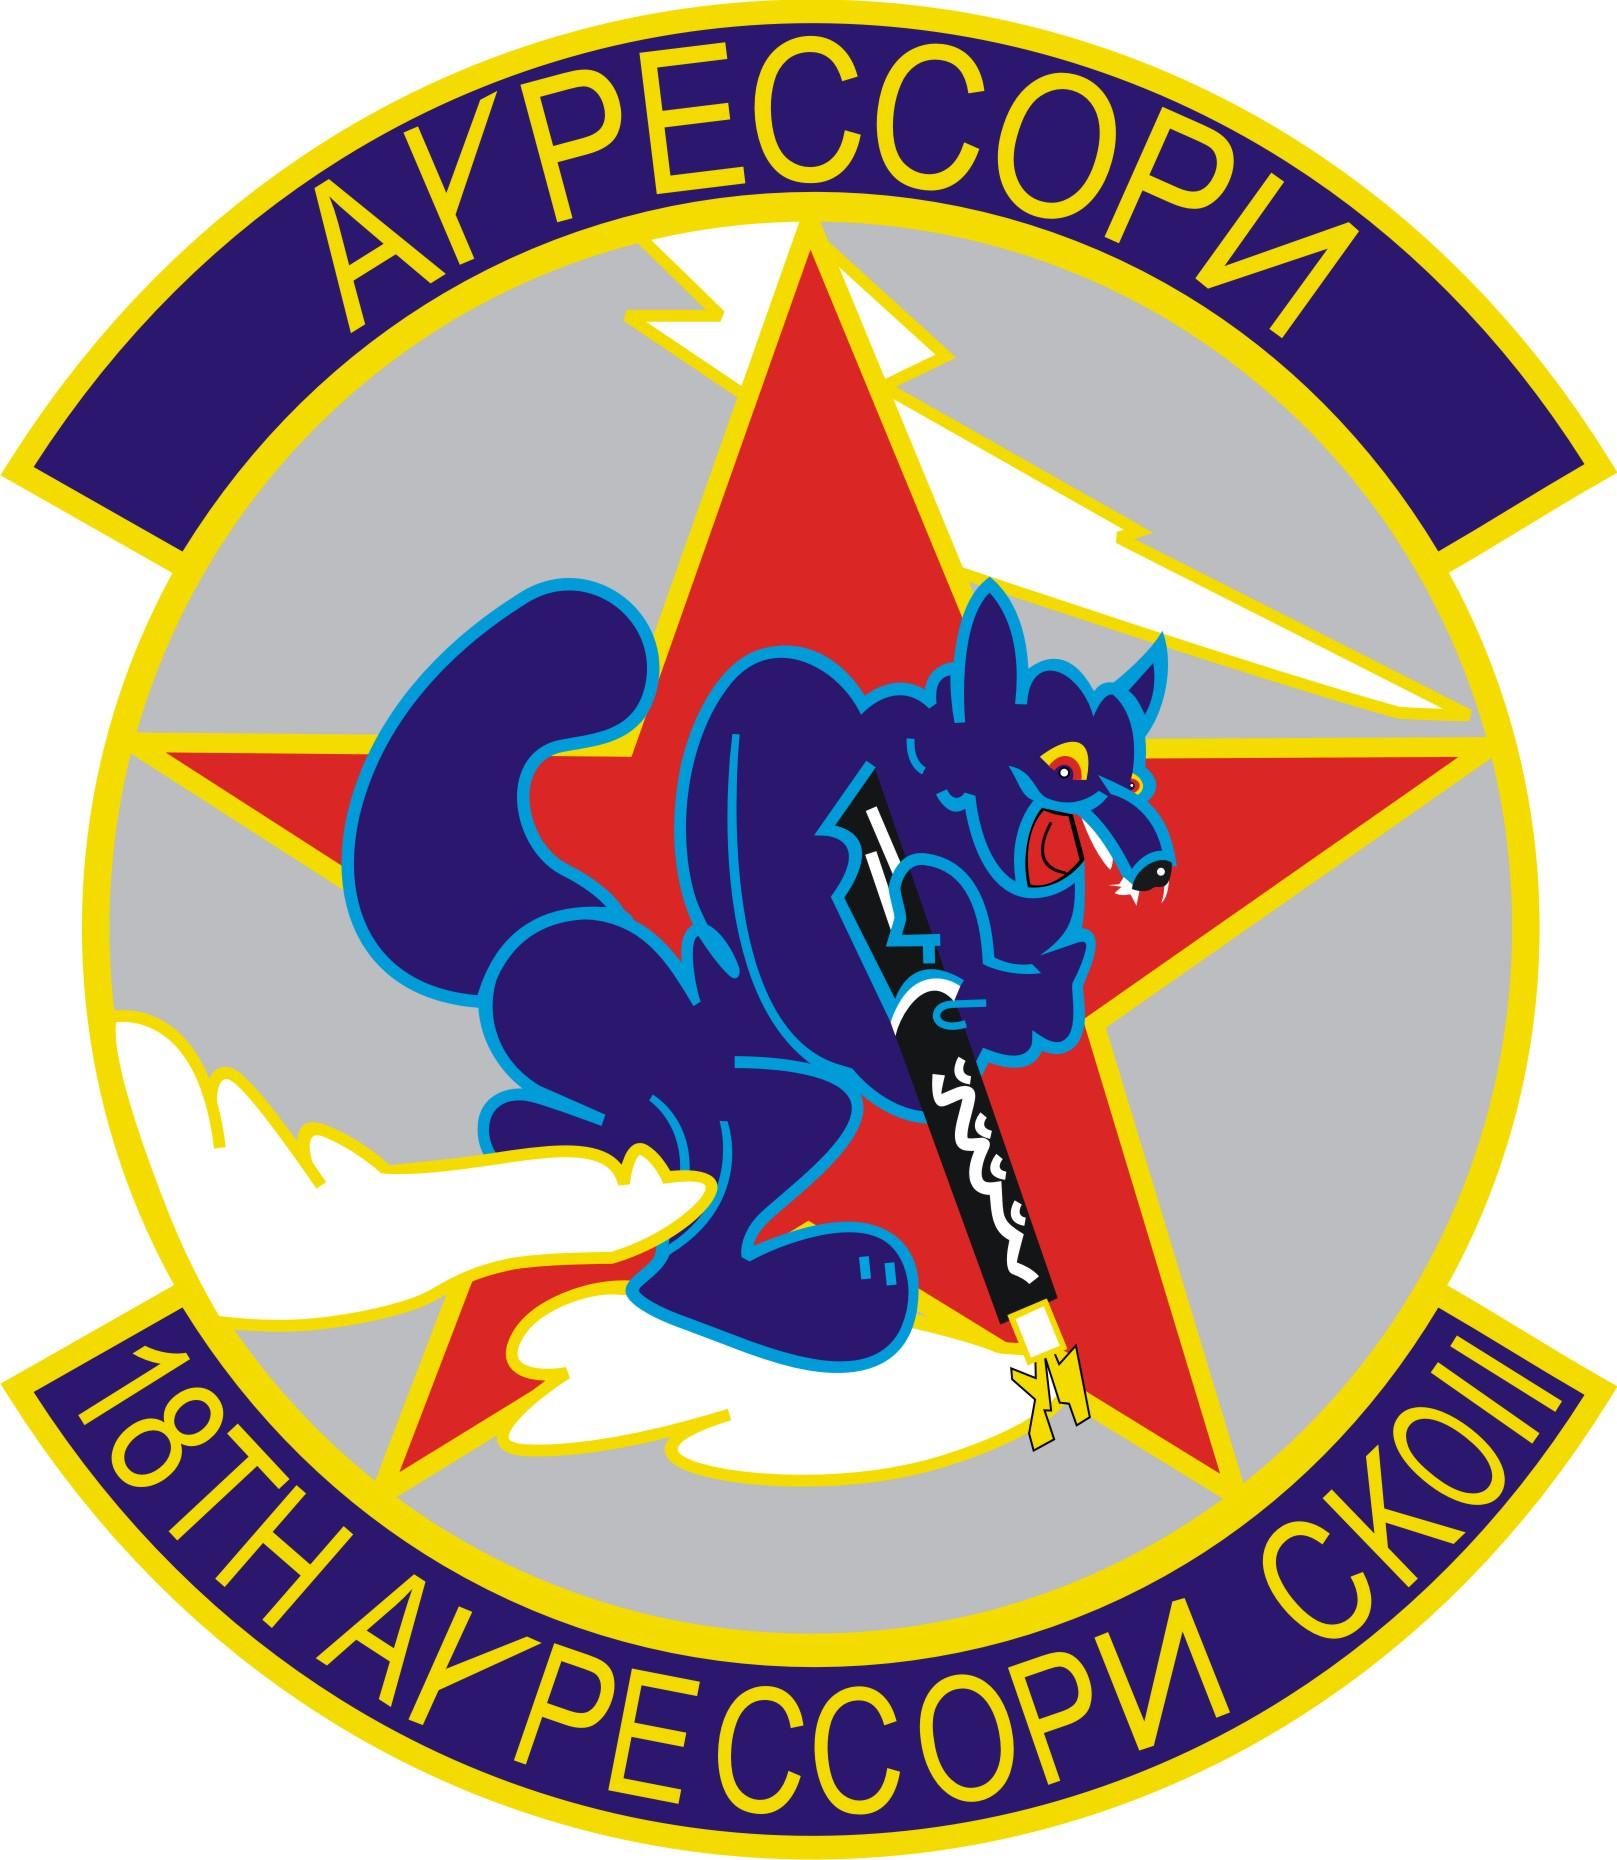 833rd aero squadron - 18th Aypeccopm